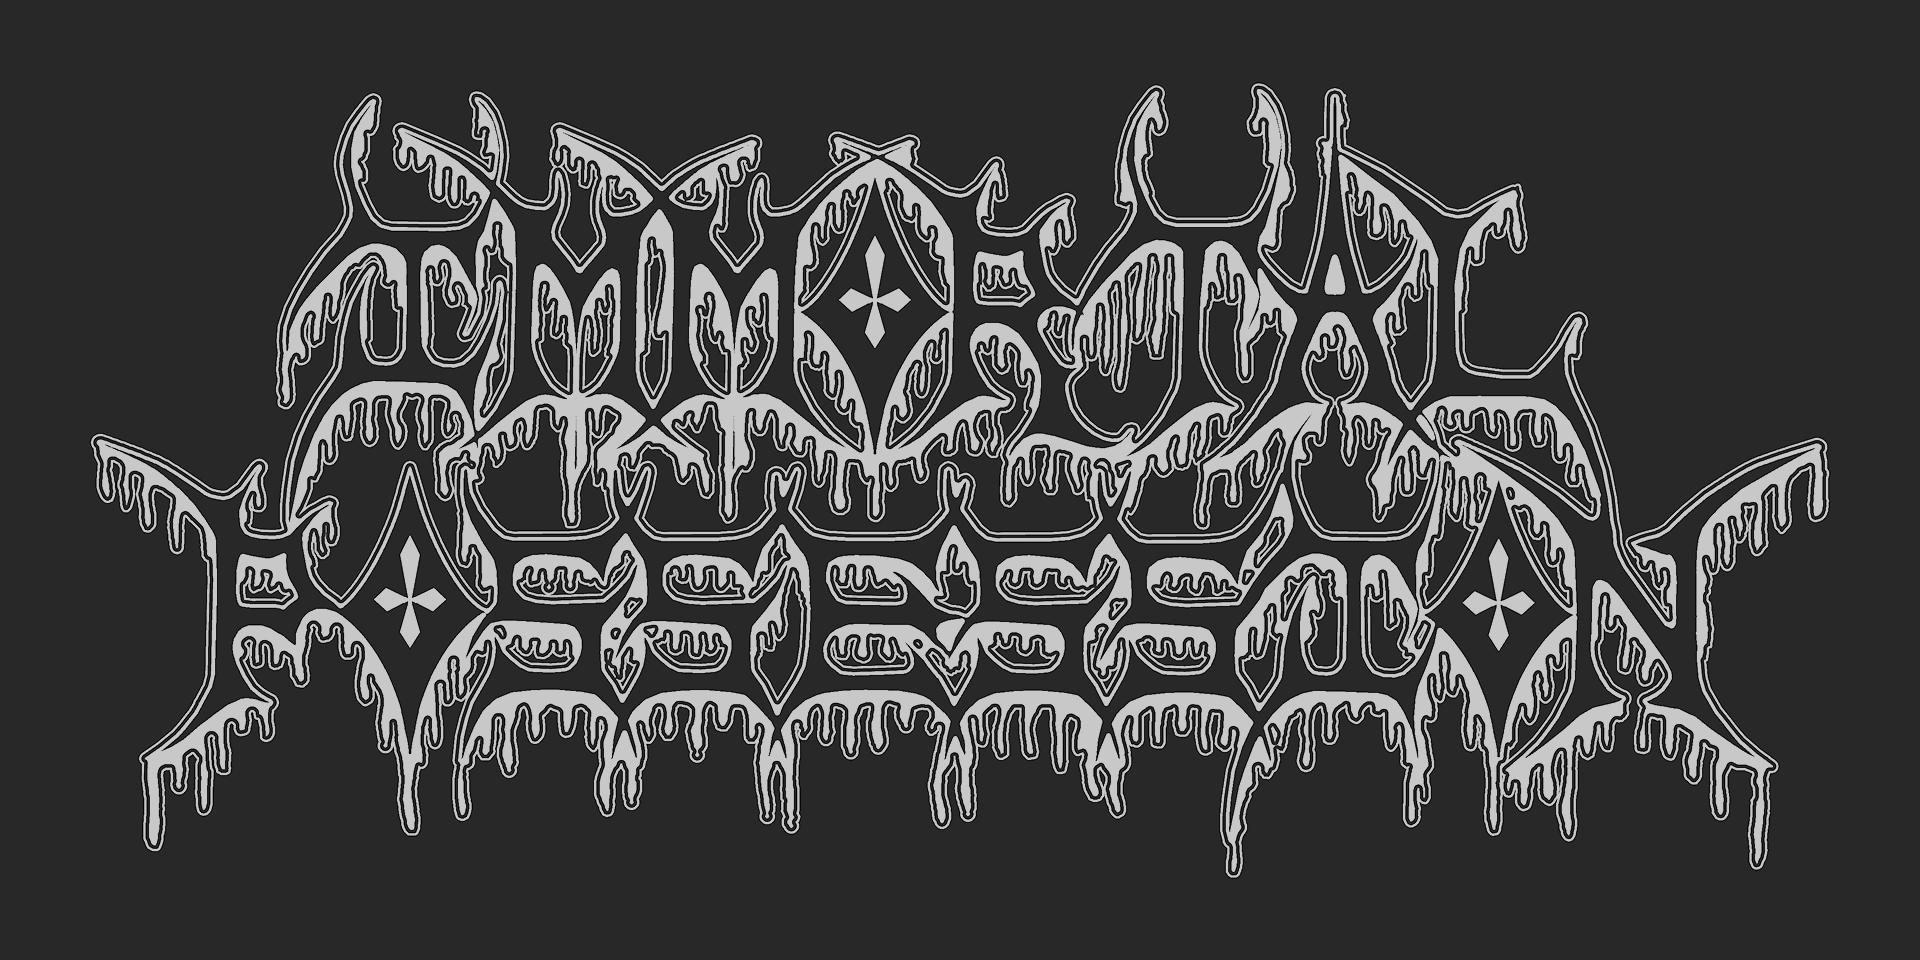 Immortal Possession band logo